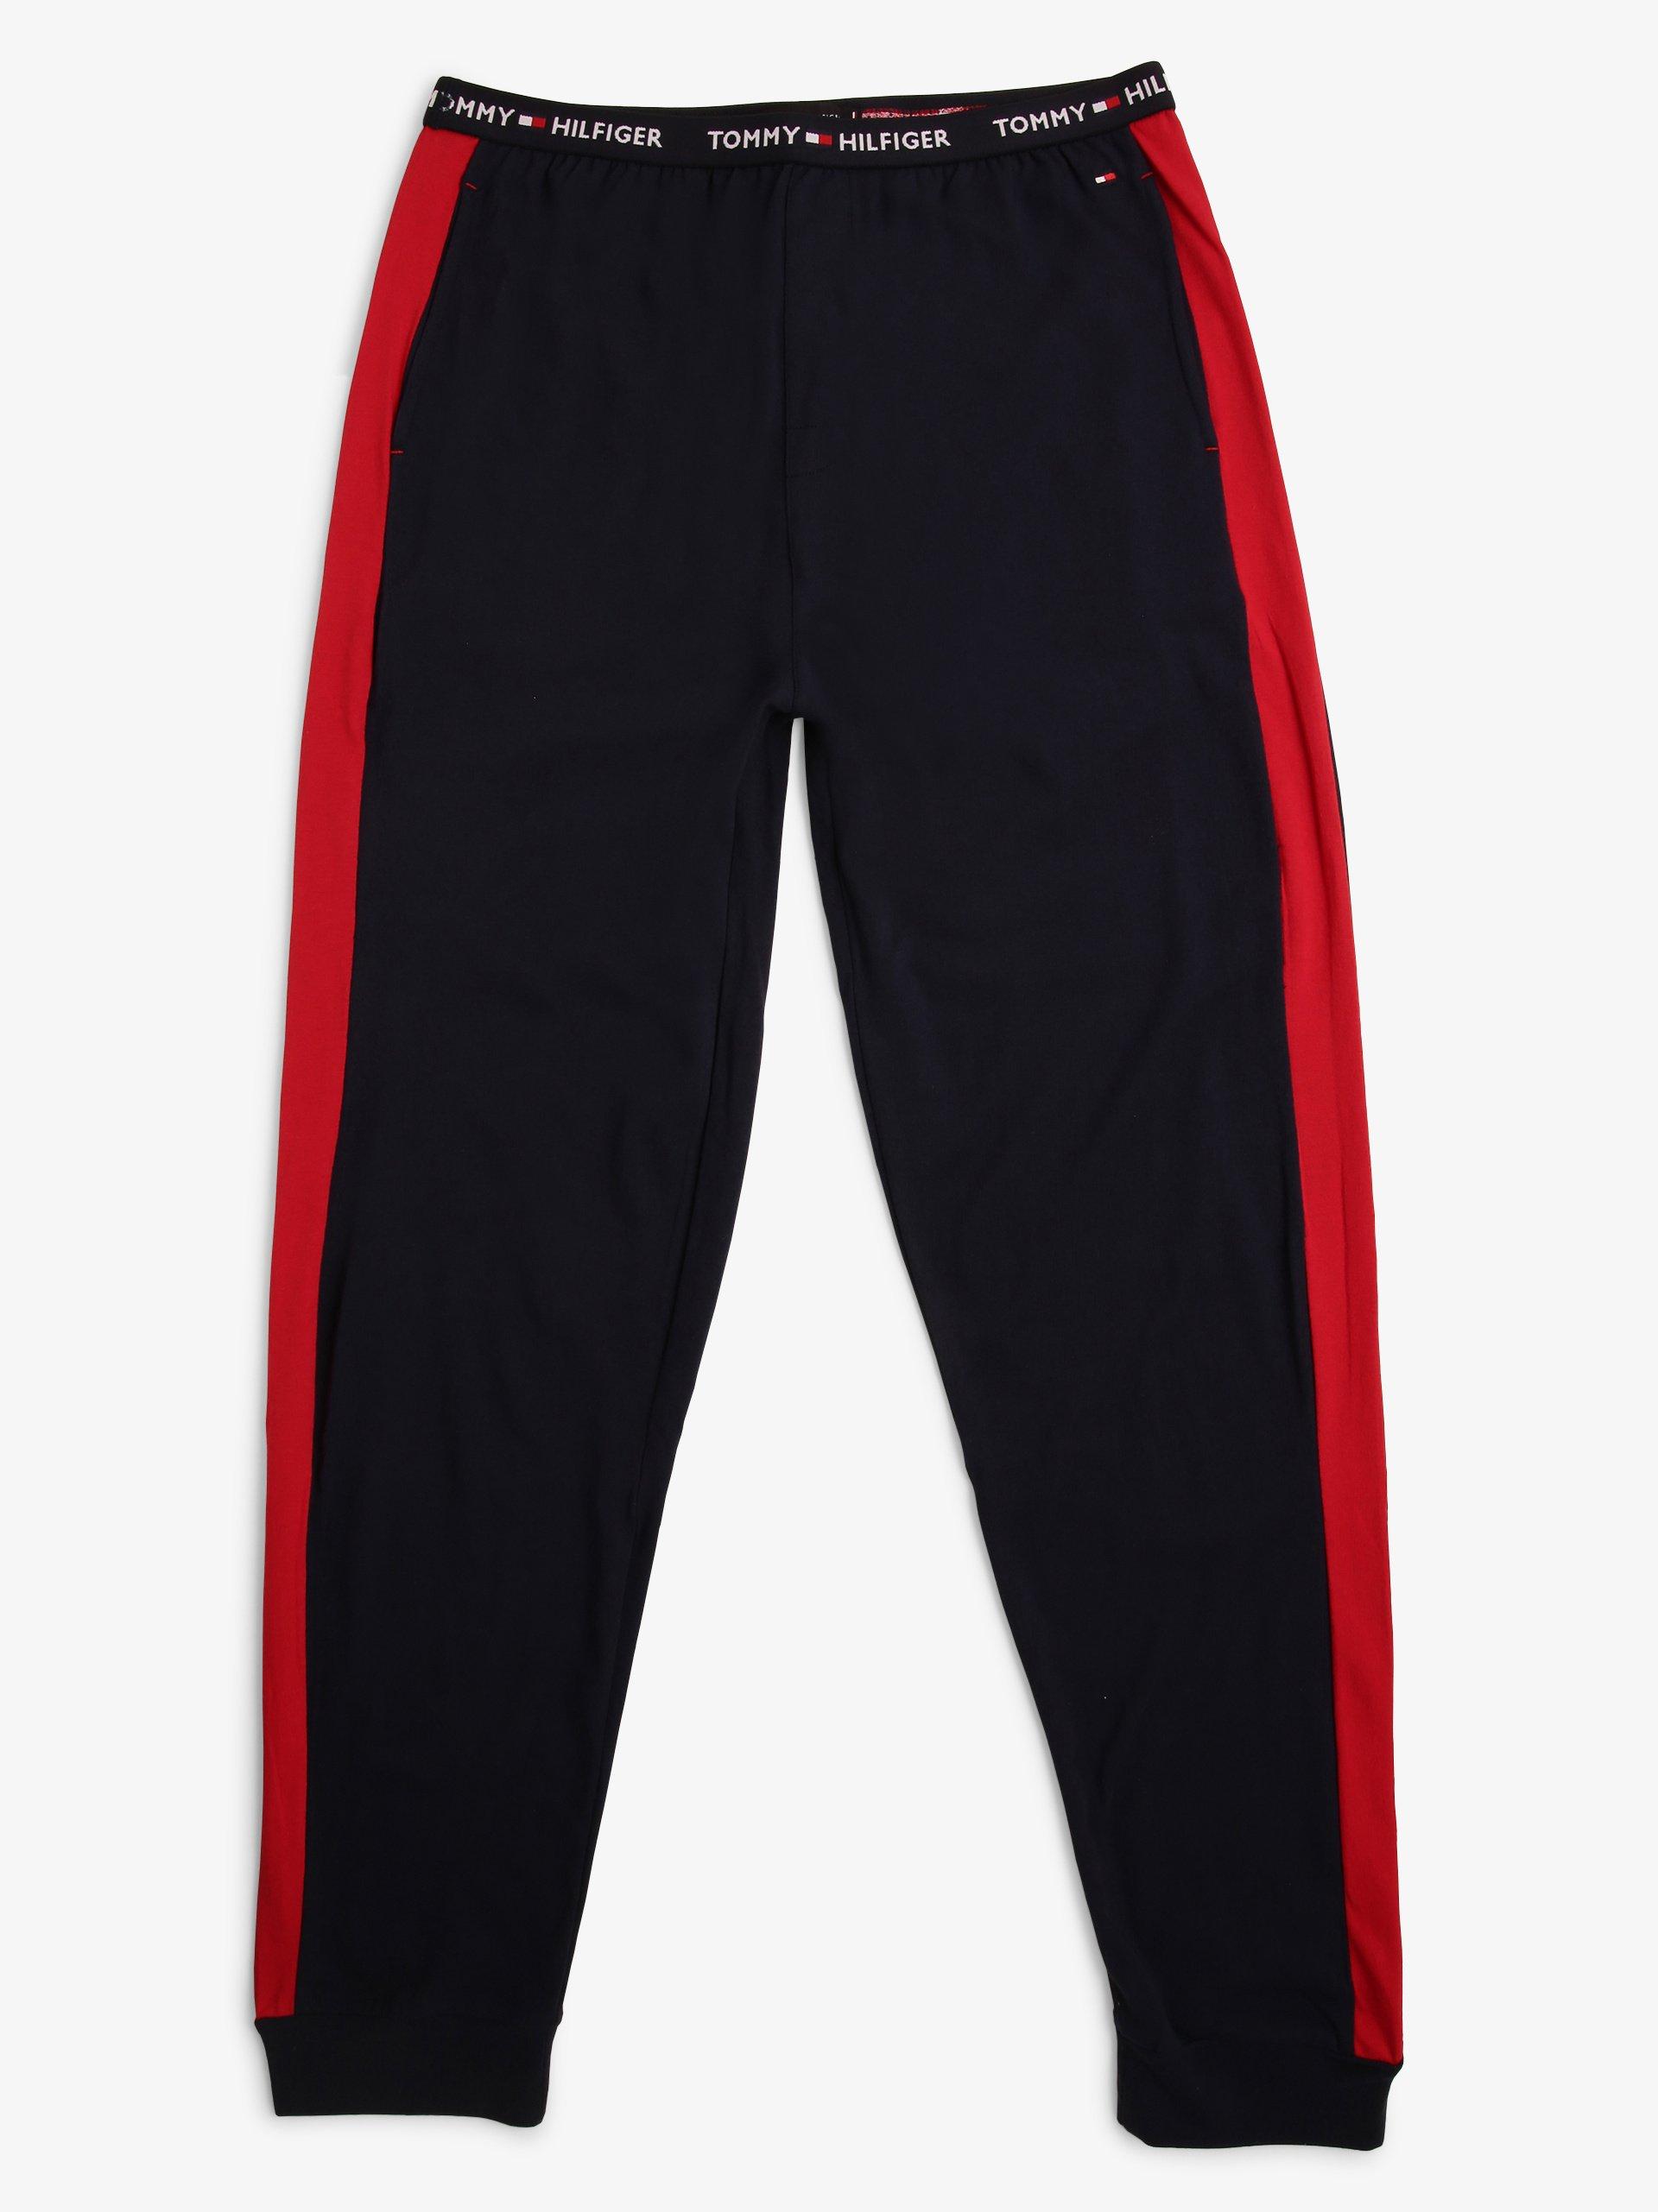 Tommy Hilfiger Herren Pyjama-Hose